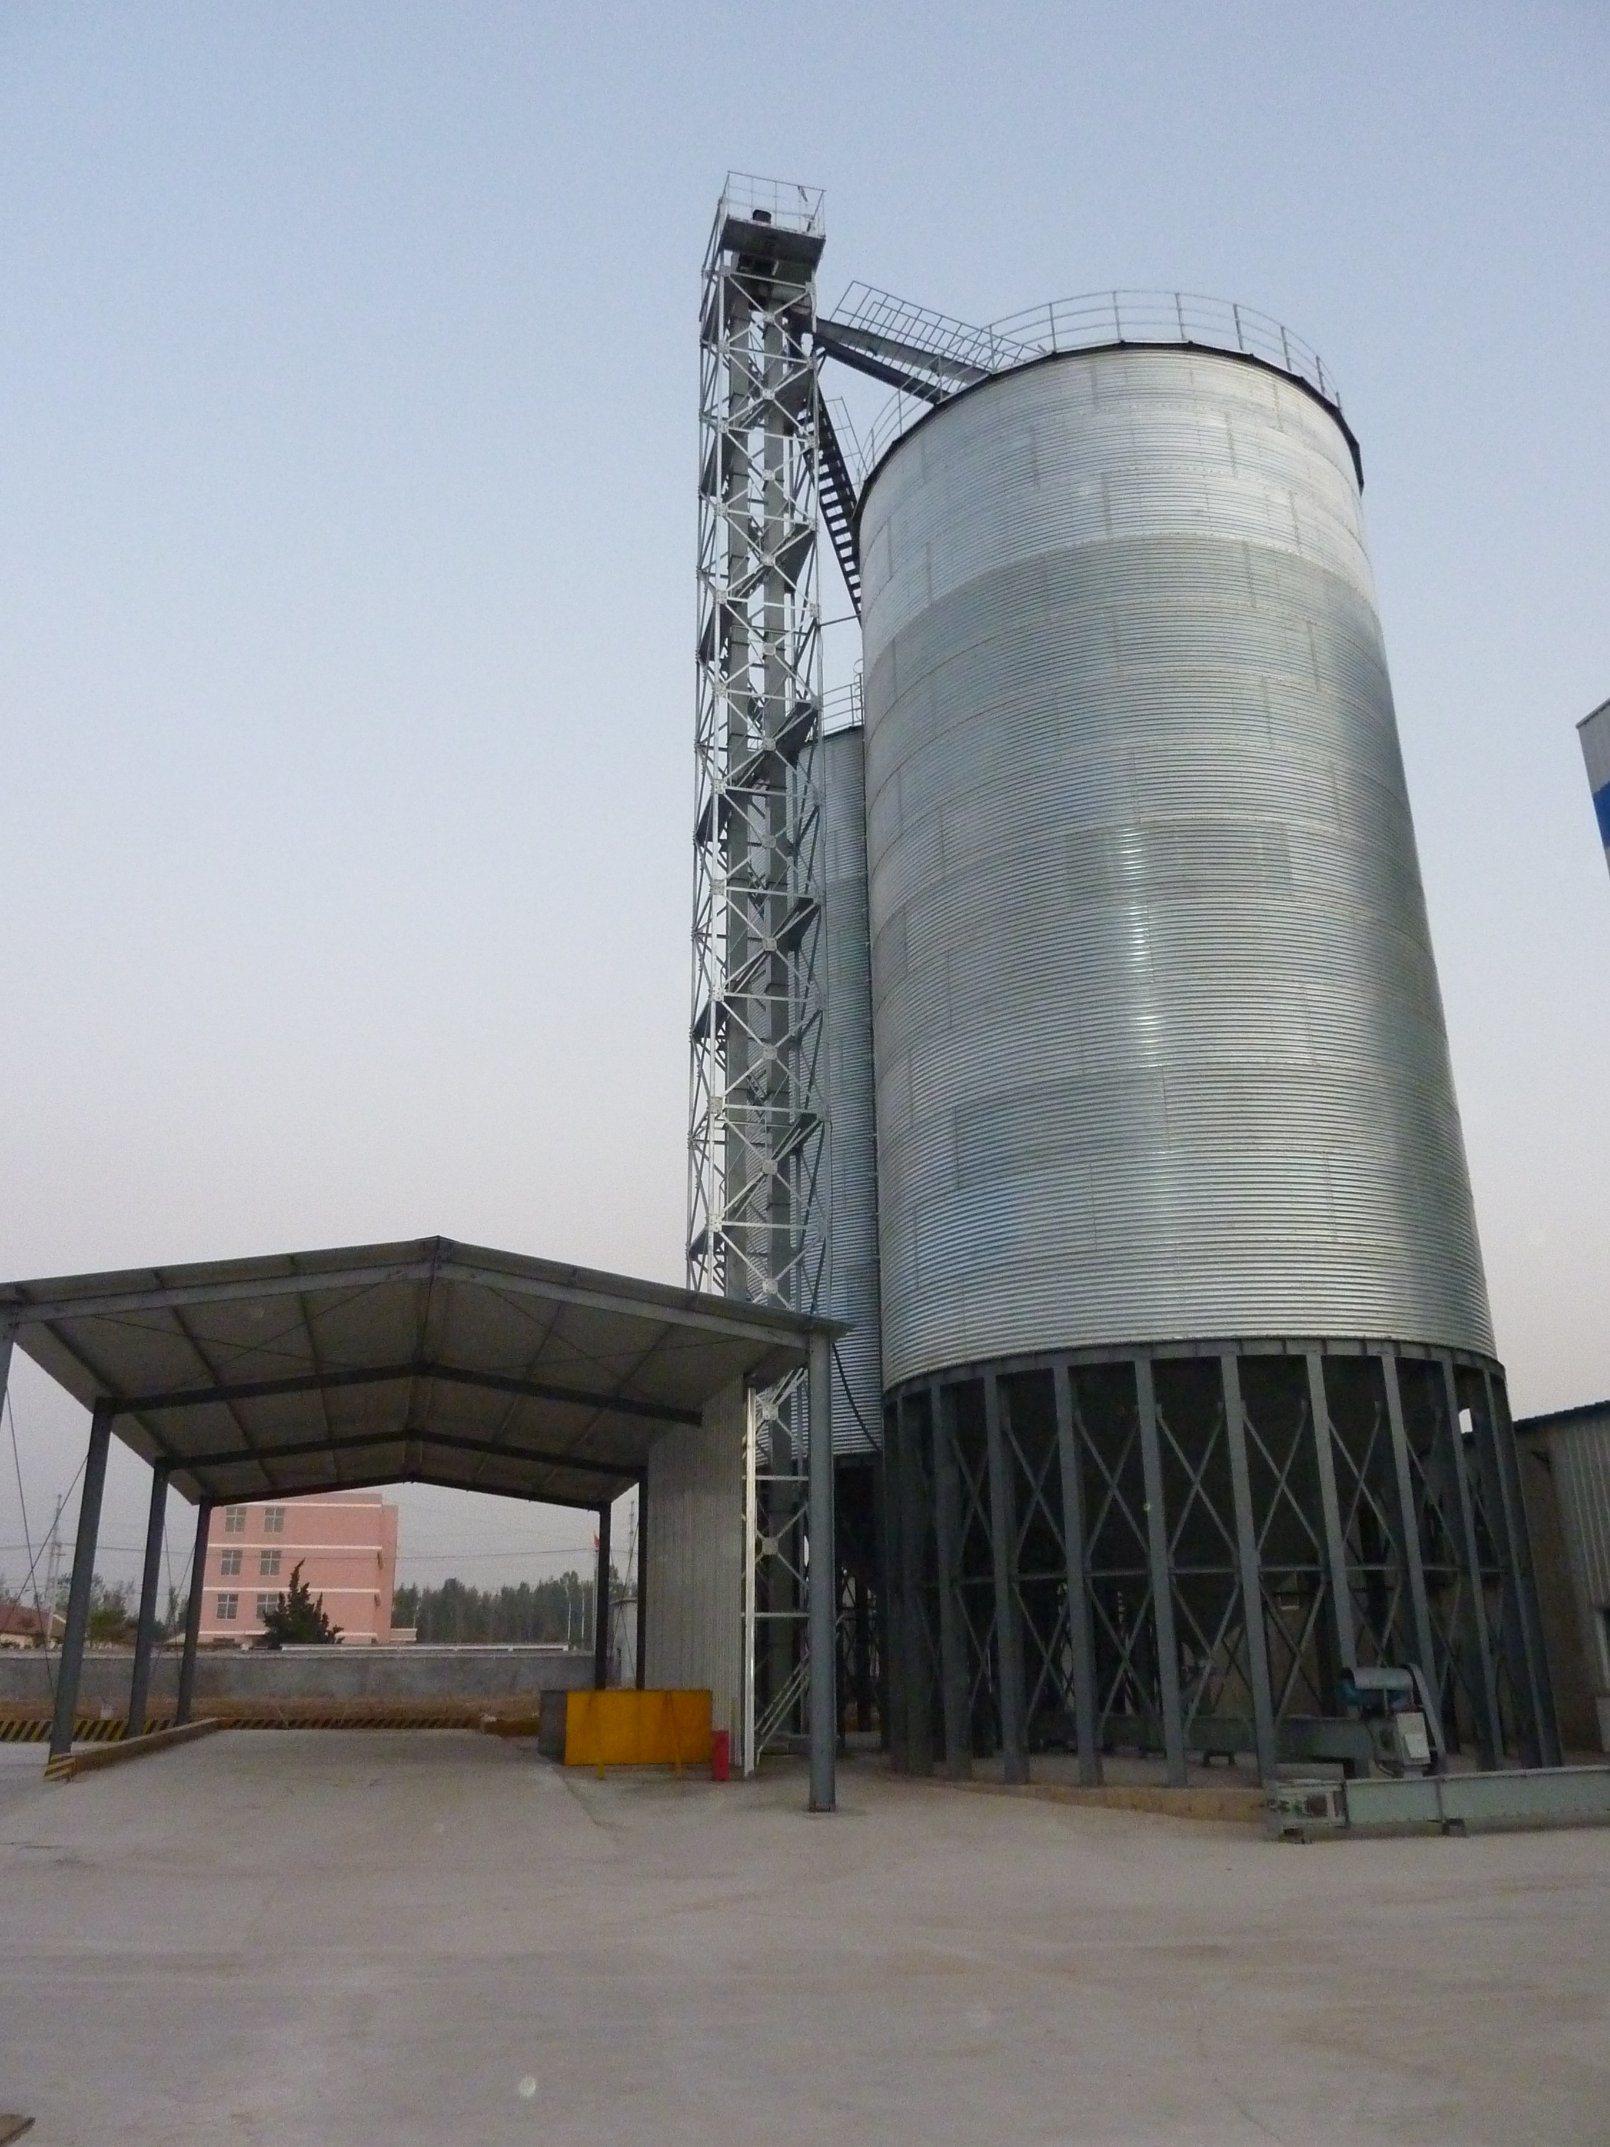 Image result for storage silos